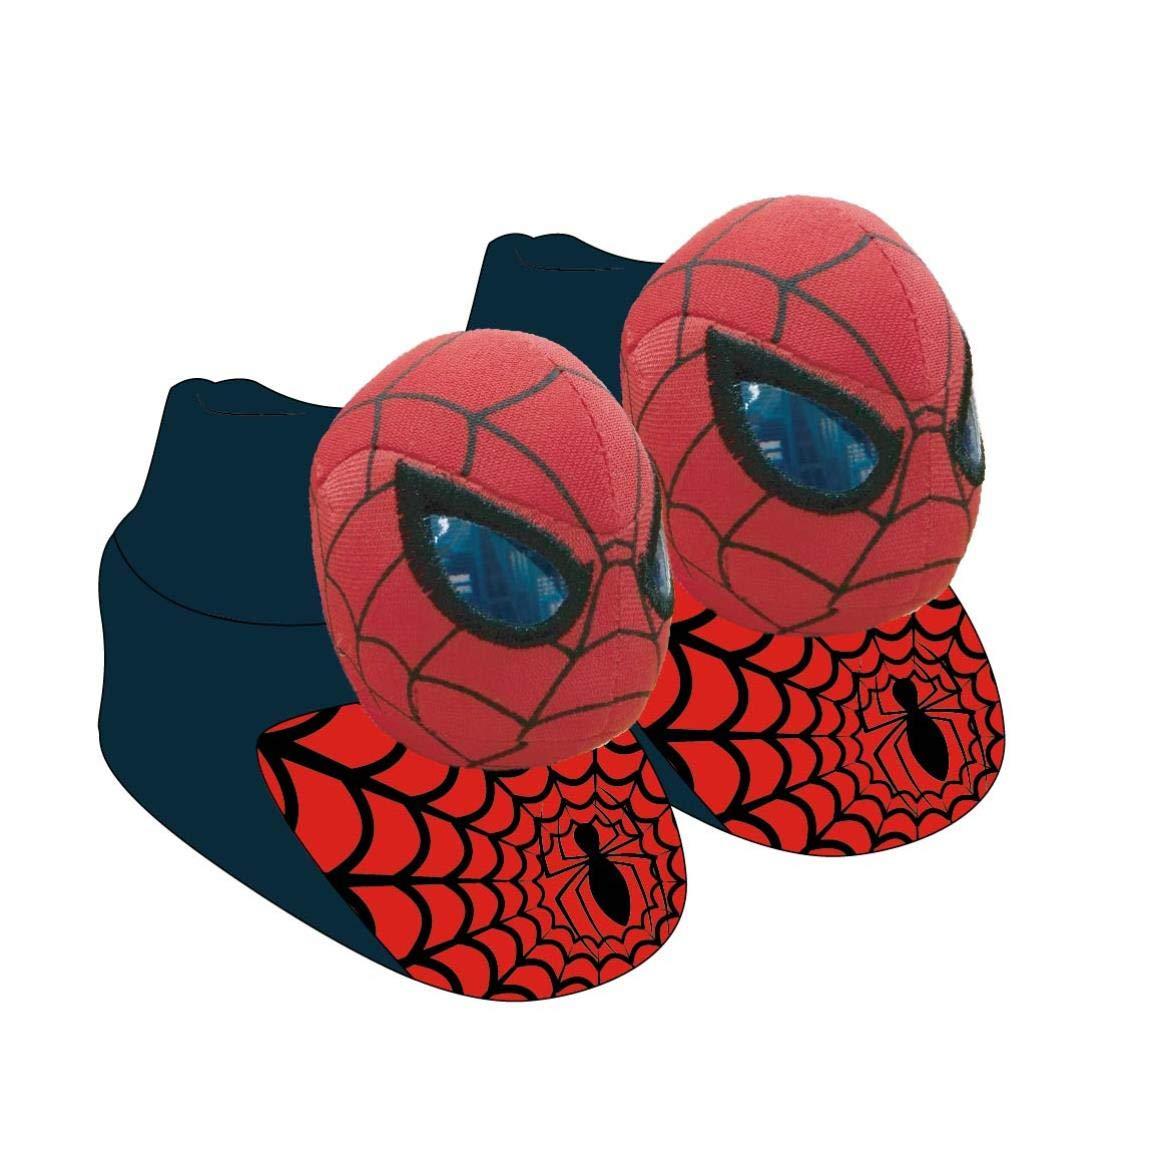 Cerd/á Zapatillas de CASA 3D Spiderman Chaussons gar/çon